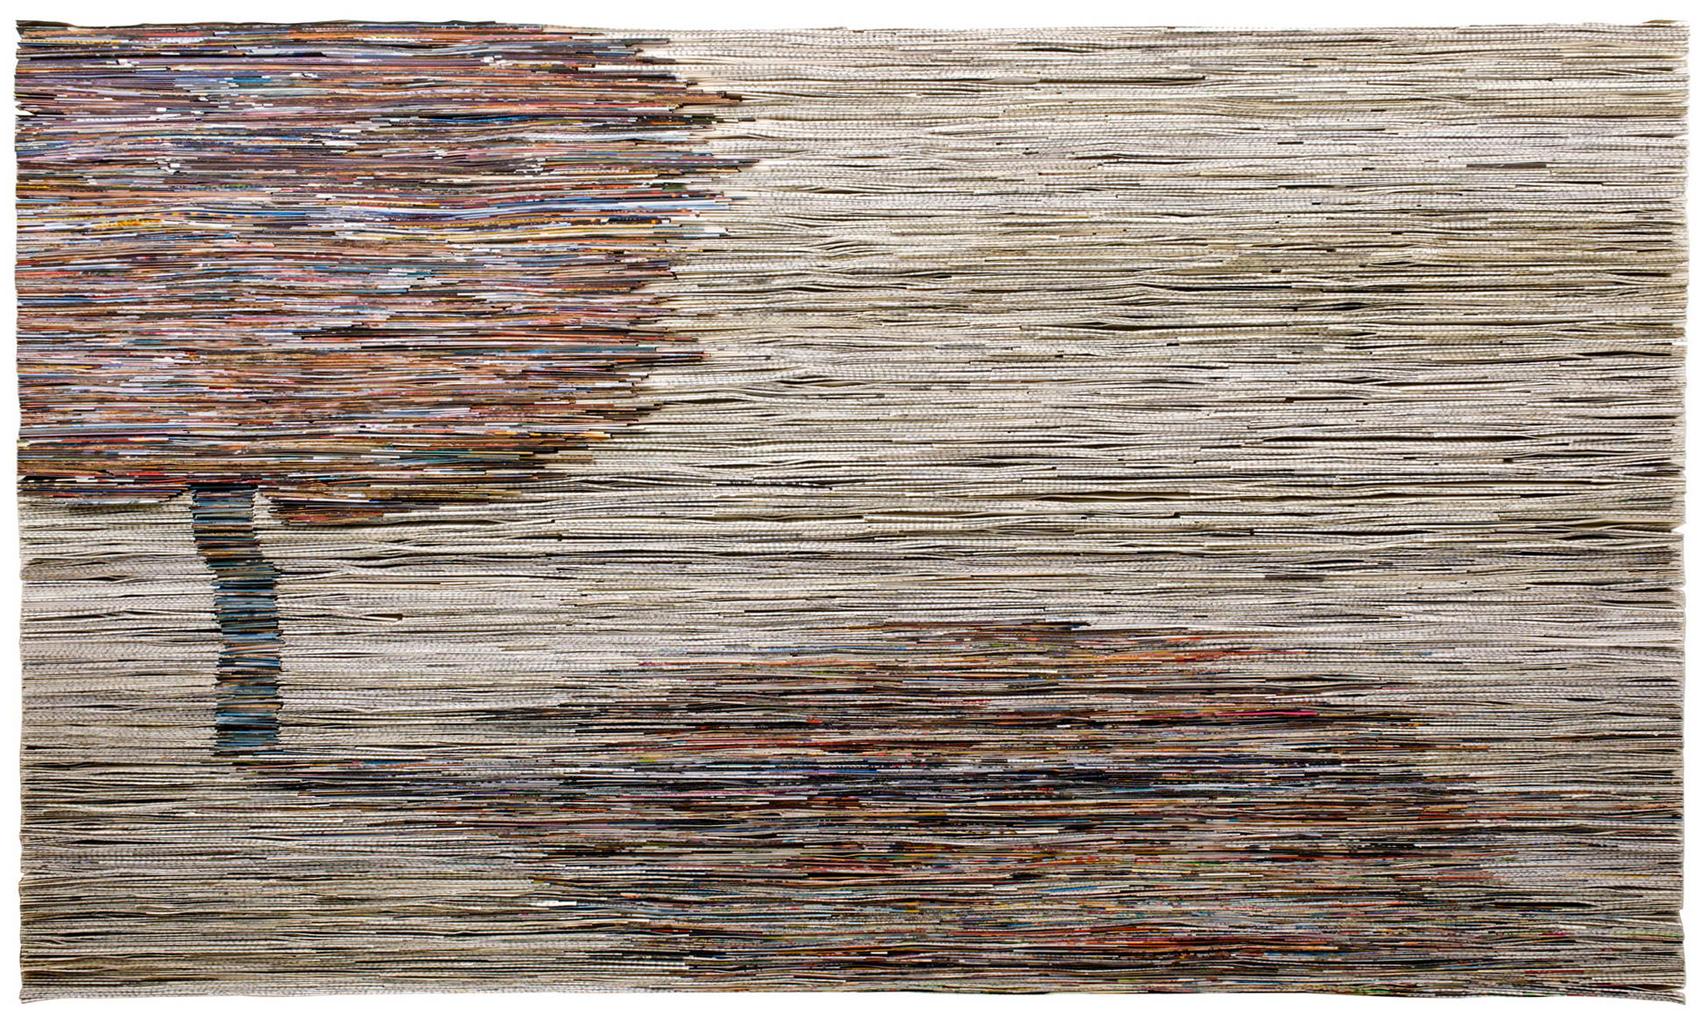 Cezanna | Folded Paper | 72x124cm